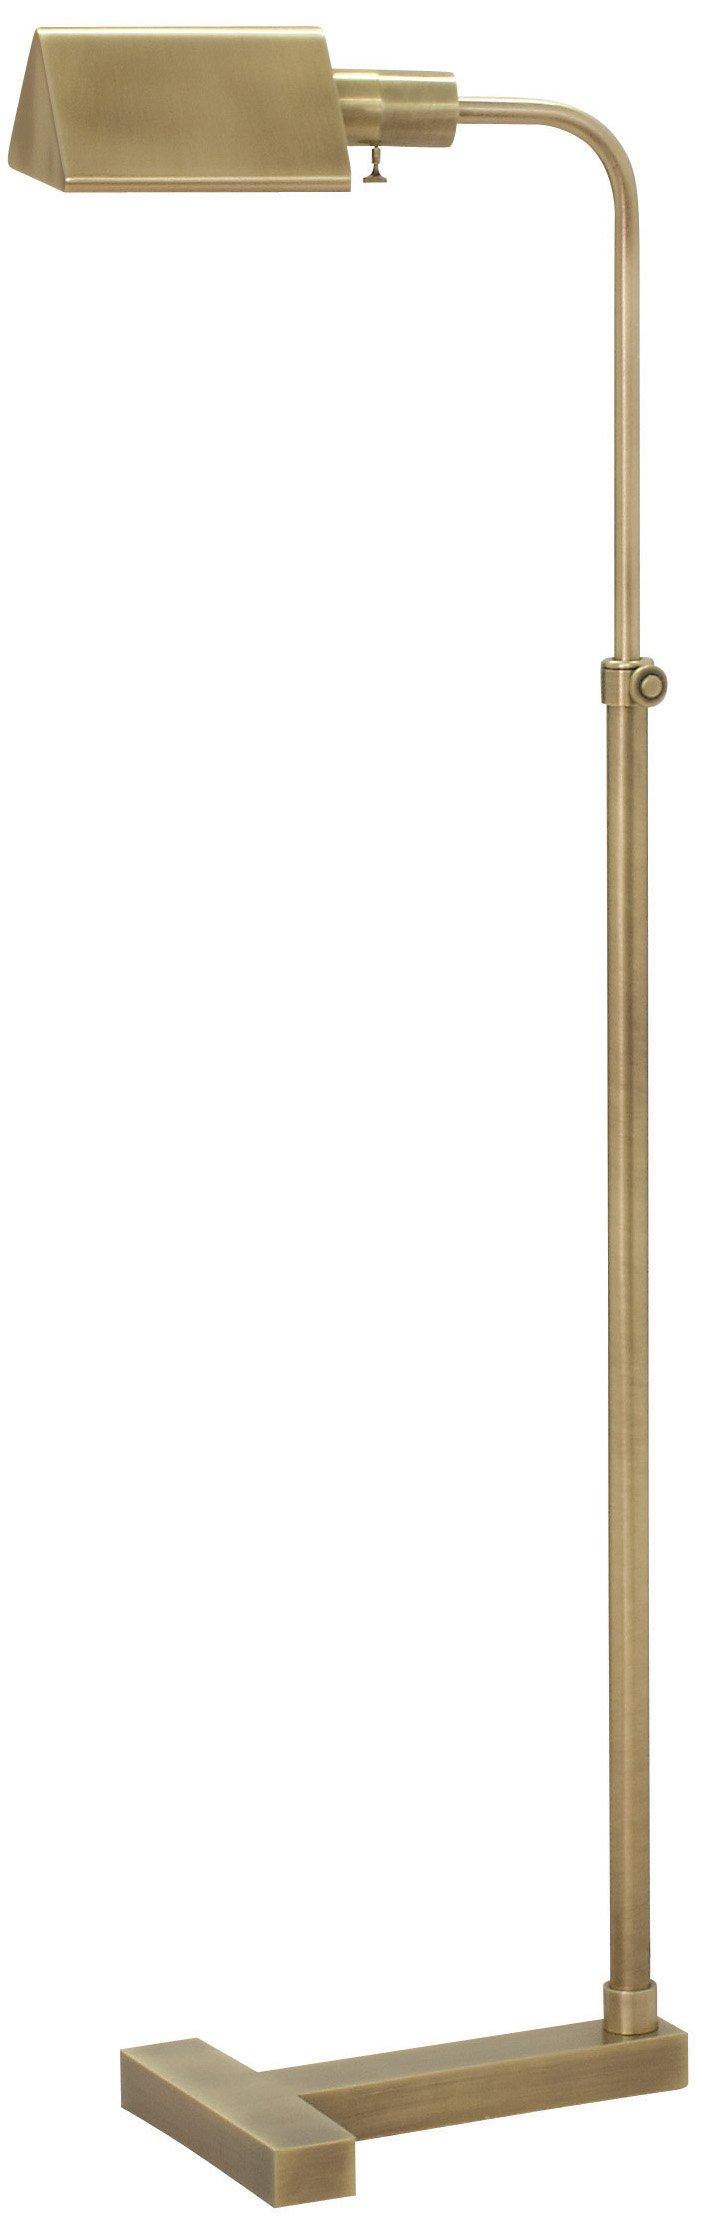 House of Troy F100-AB Fairfax Pharmacy Adjustable Floor Lamp, Antique Brass